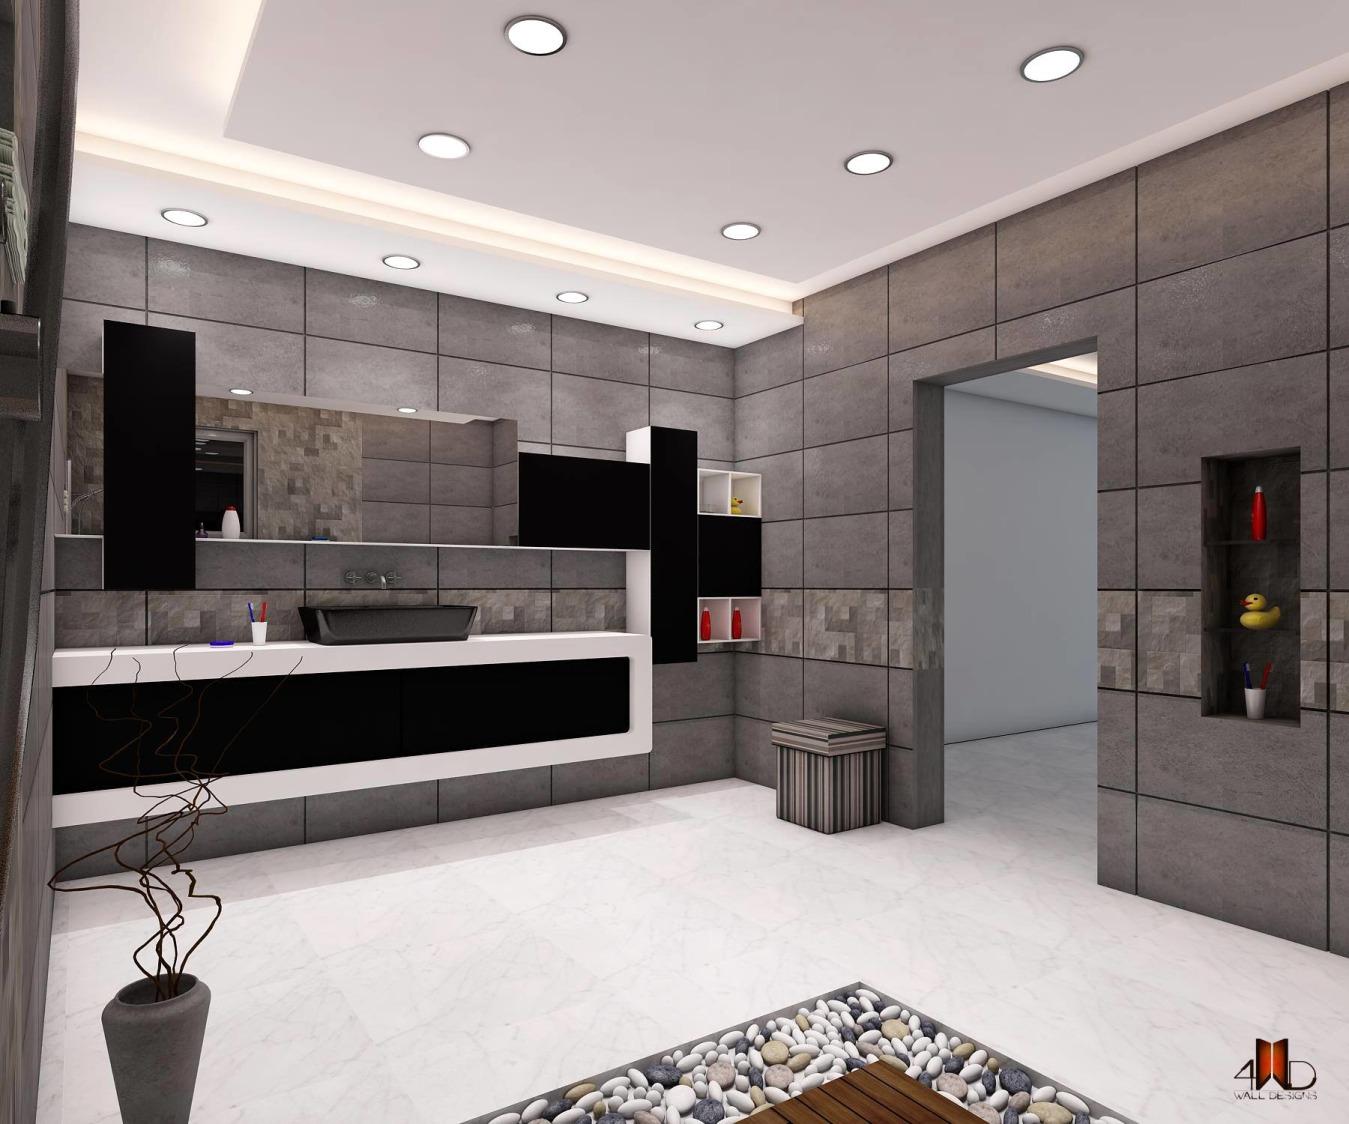 Grunge Expose by Wall Designs Contemporary | Interior Design Photos & Ideas